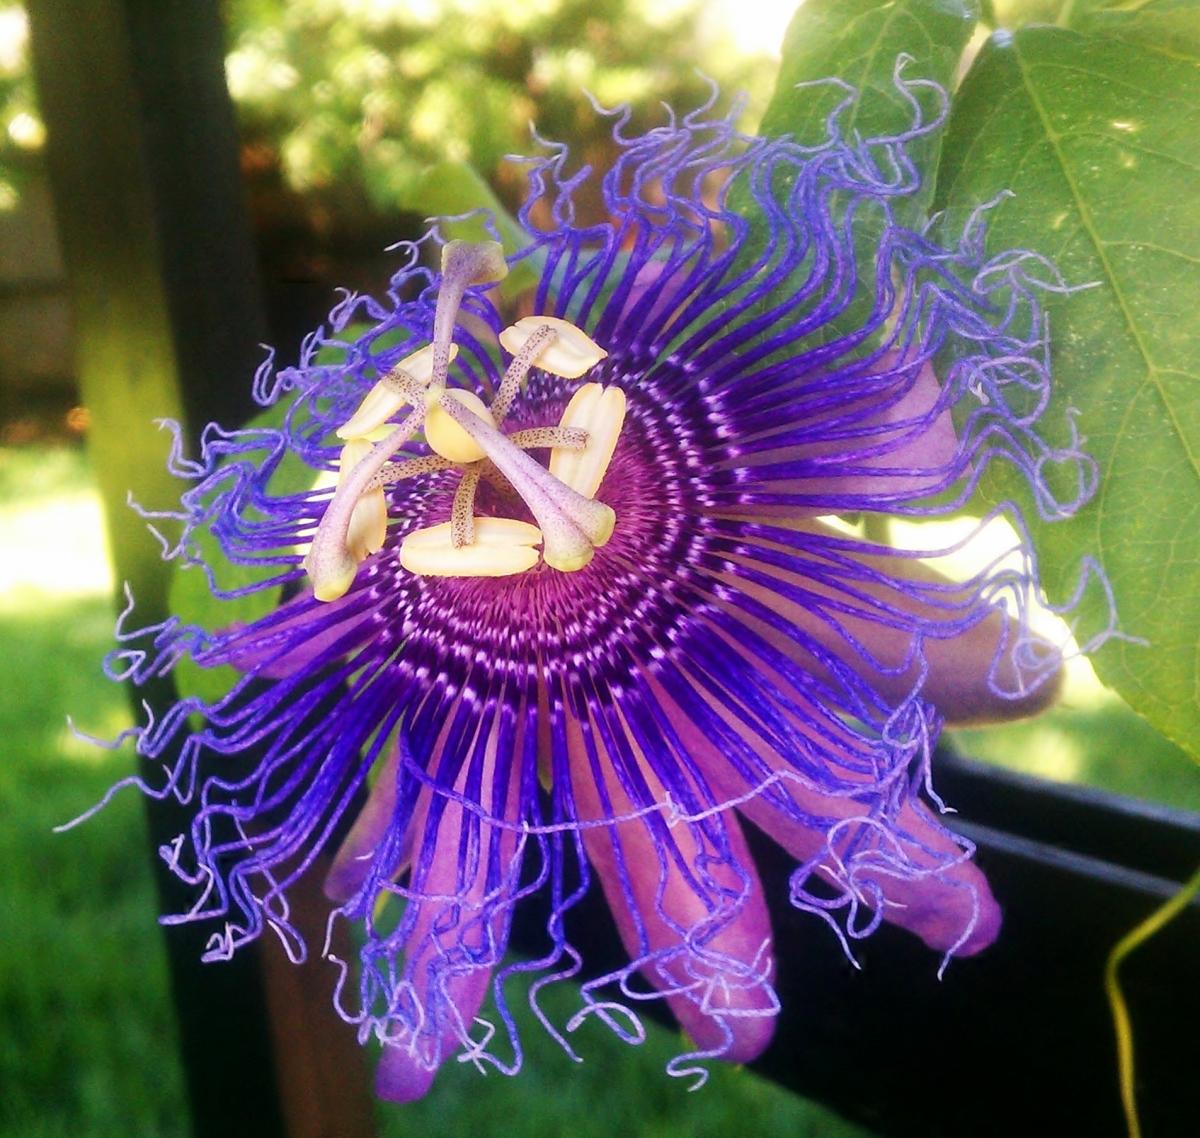 Passiflora Incense, June 12, 2012